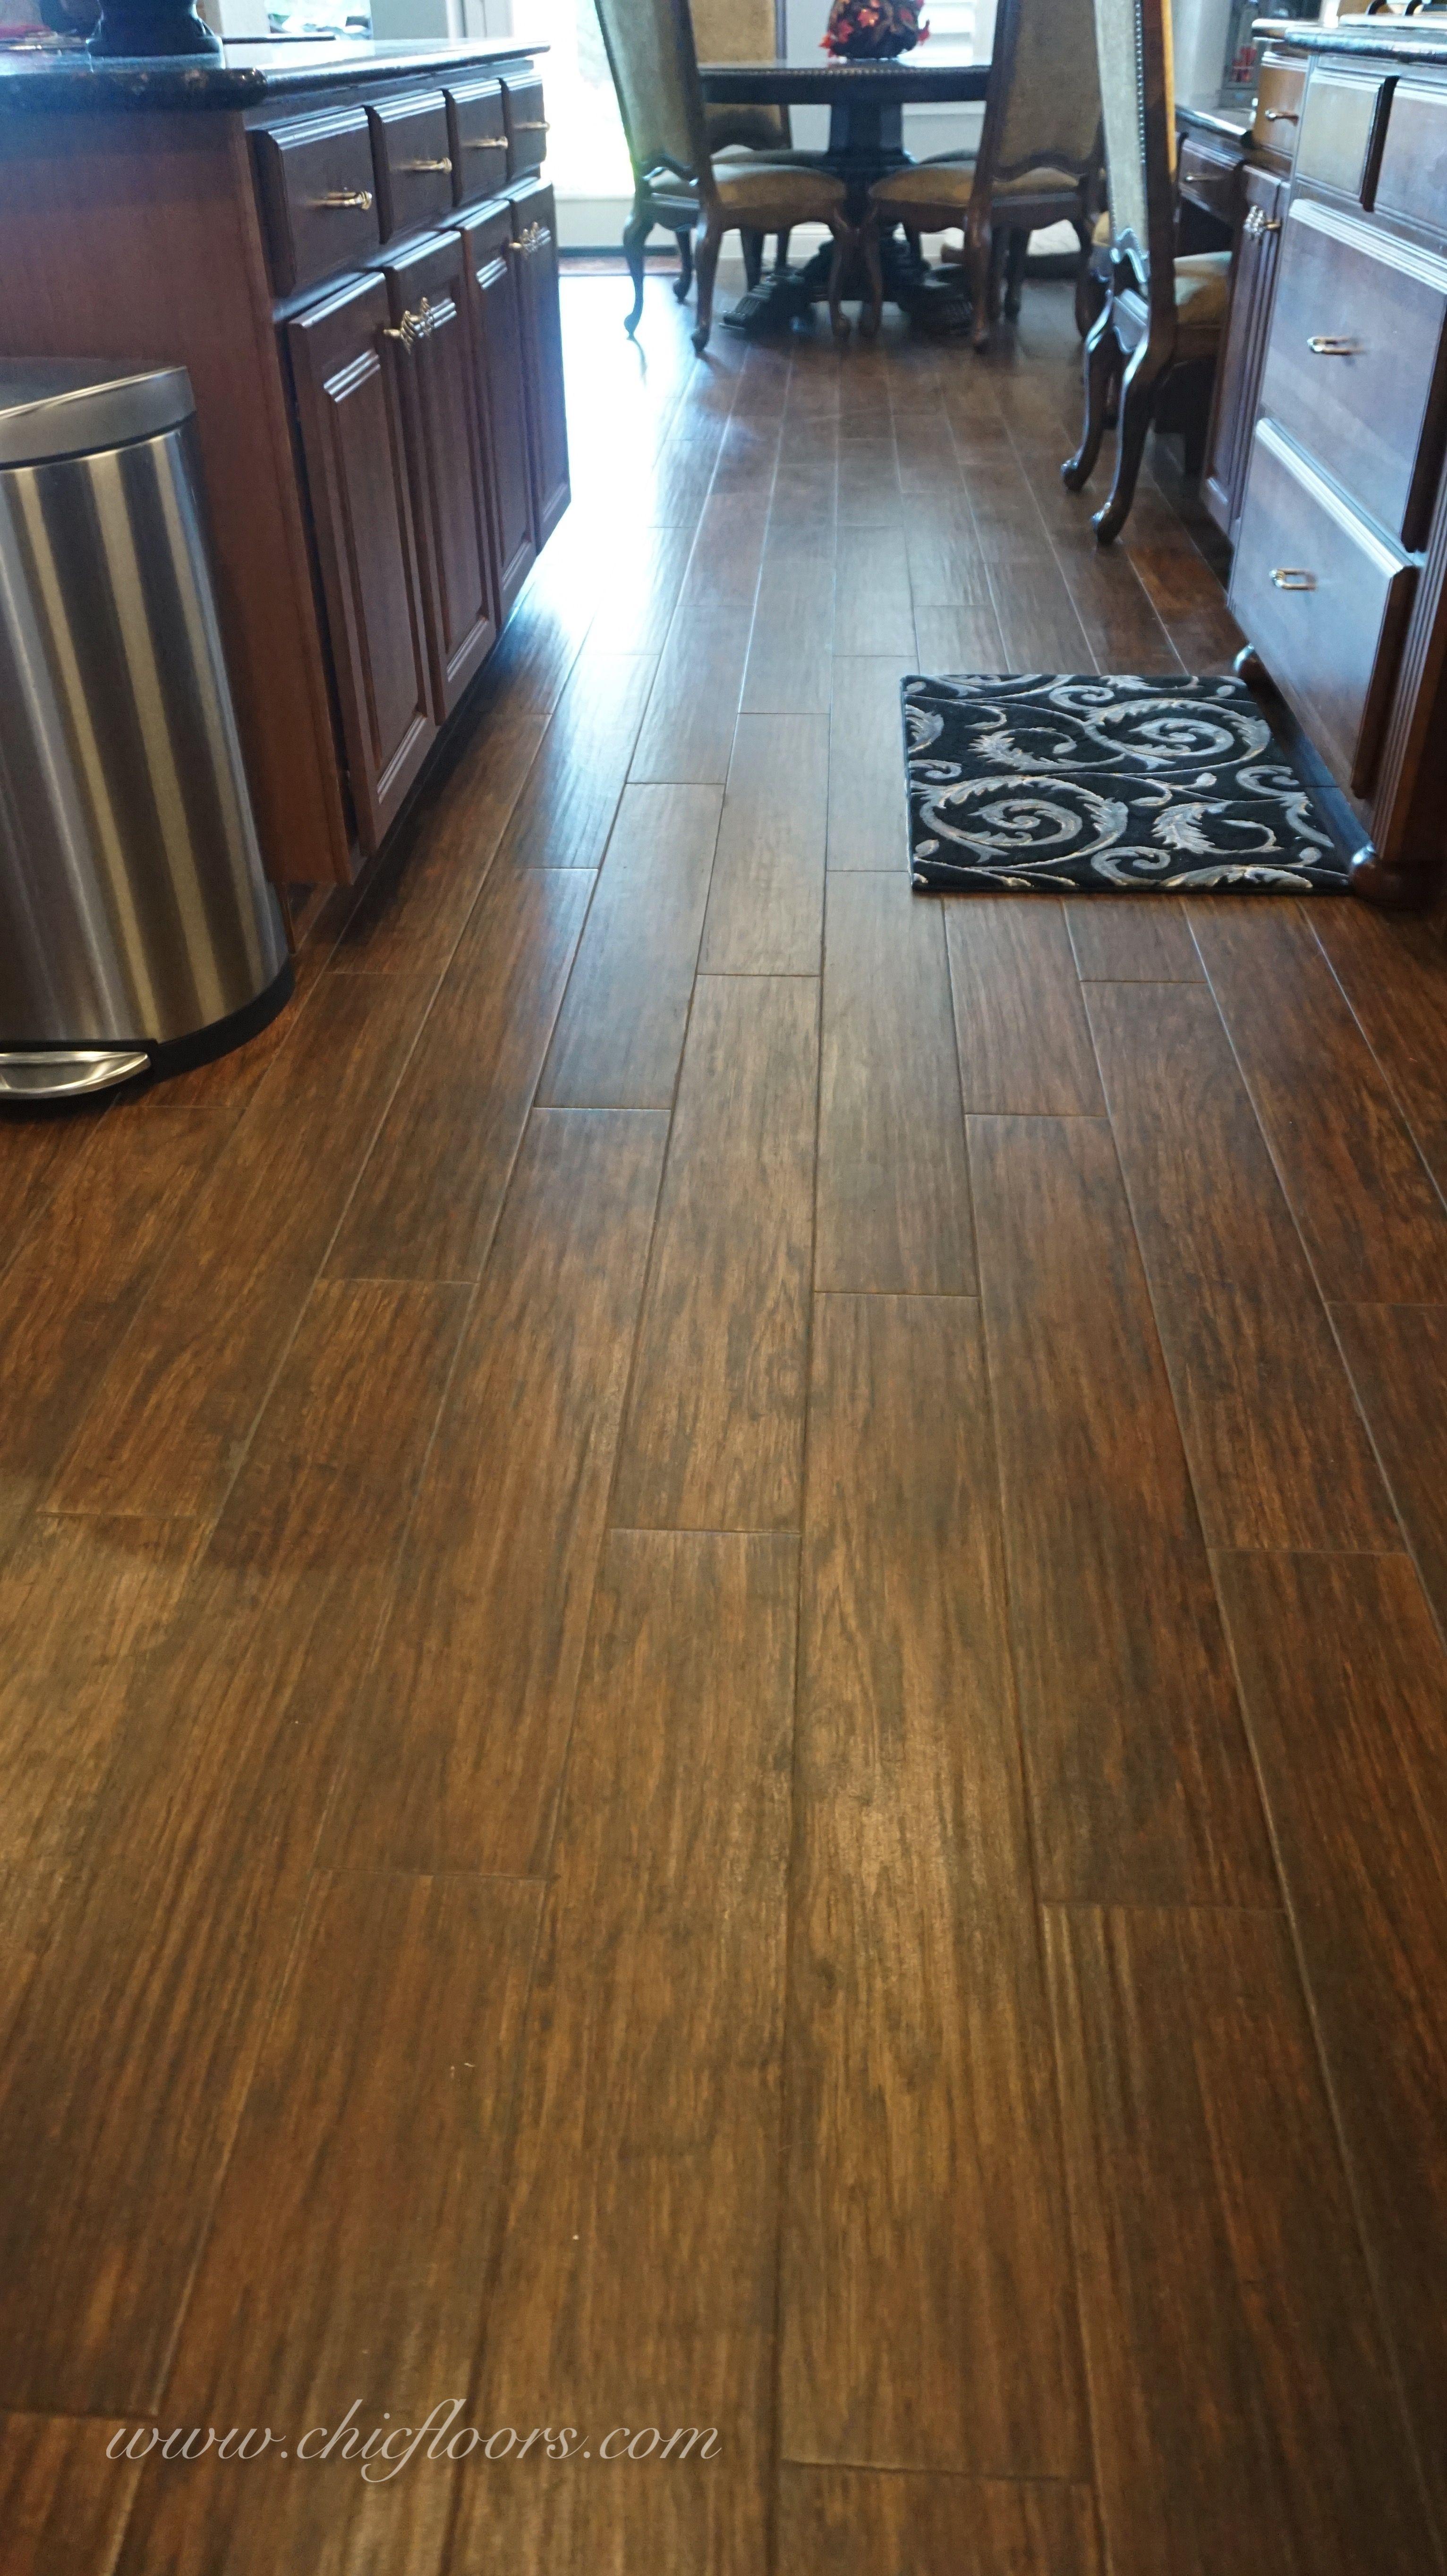 hardwood floor refinishing lancaster pa of shaw floors petrified hickory 6x36 porcelain tile in the color 700 intended for shaw floors petrified hickory 6x36 porcelain tile in the color 700 fossil